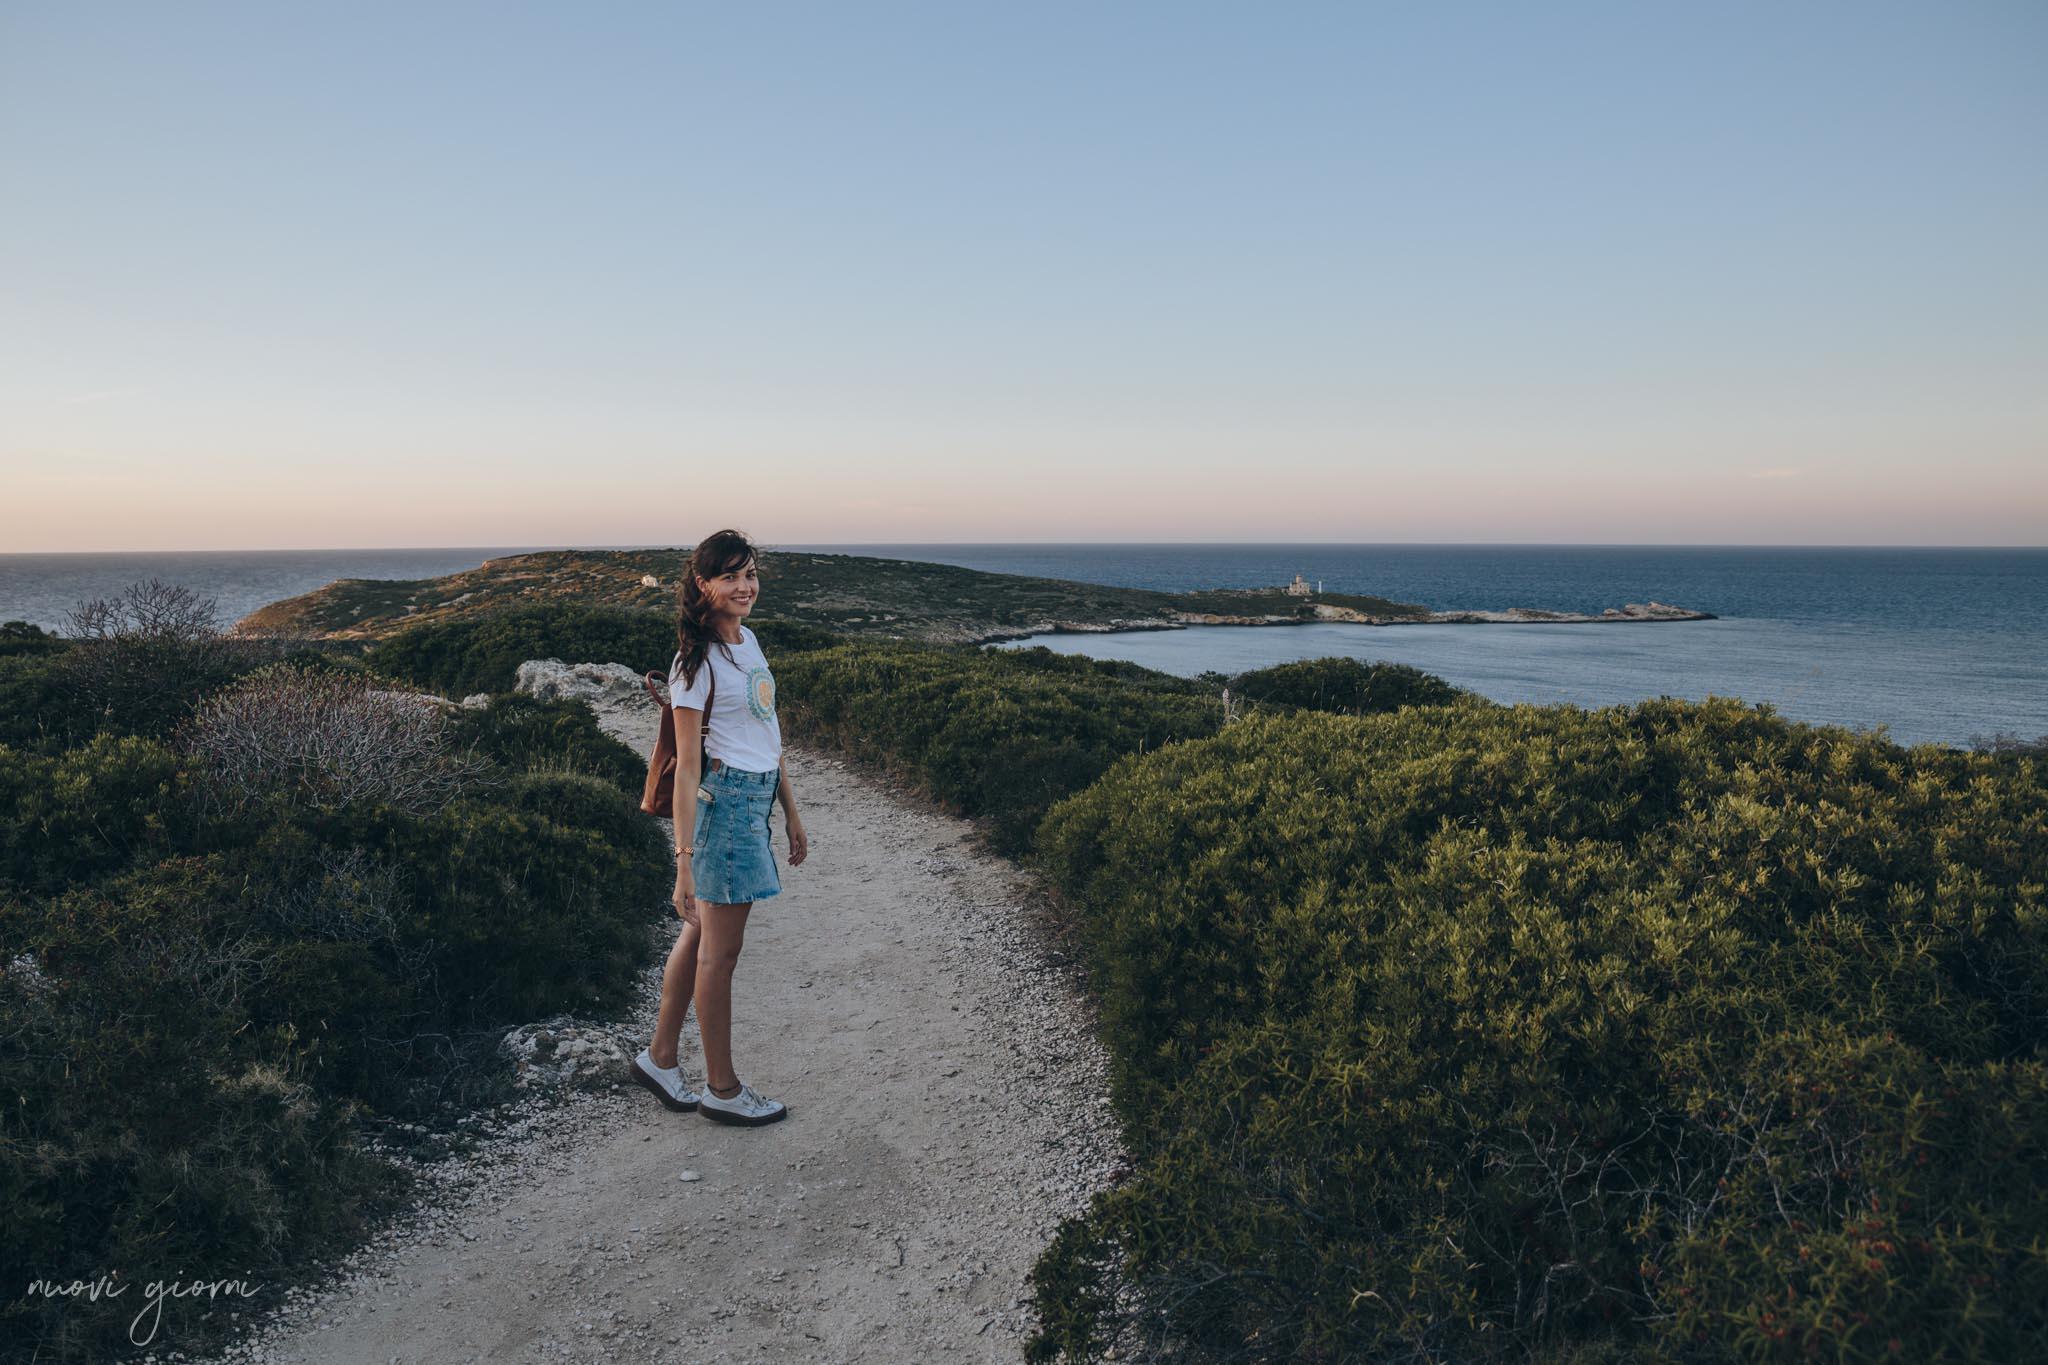 Isole Tremiti Nuovi Giorni Blog 9233